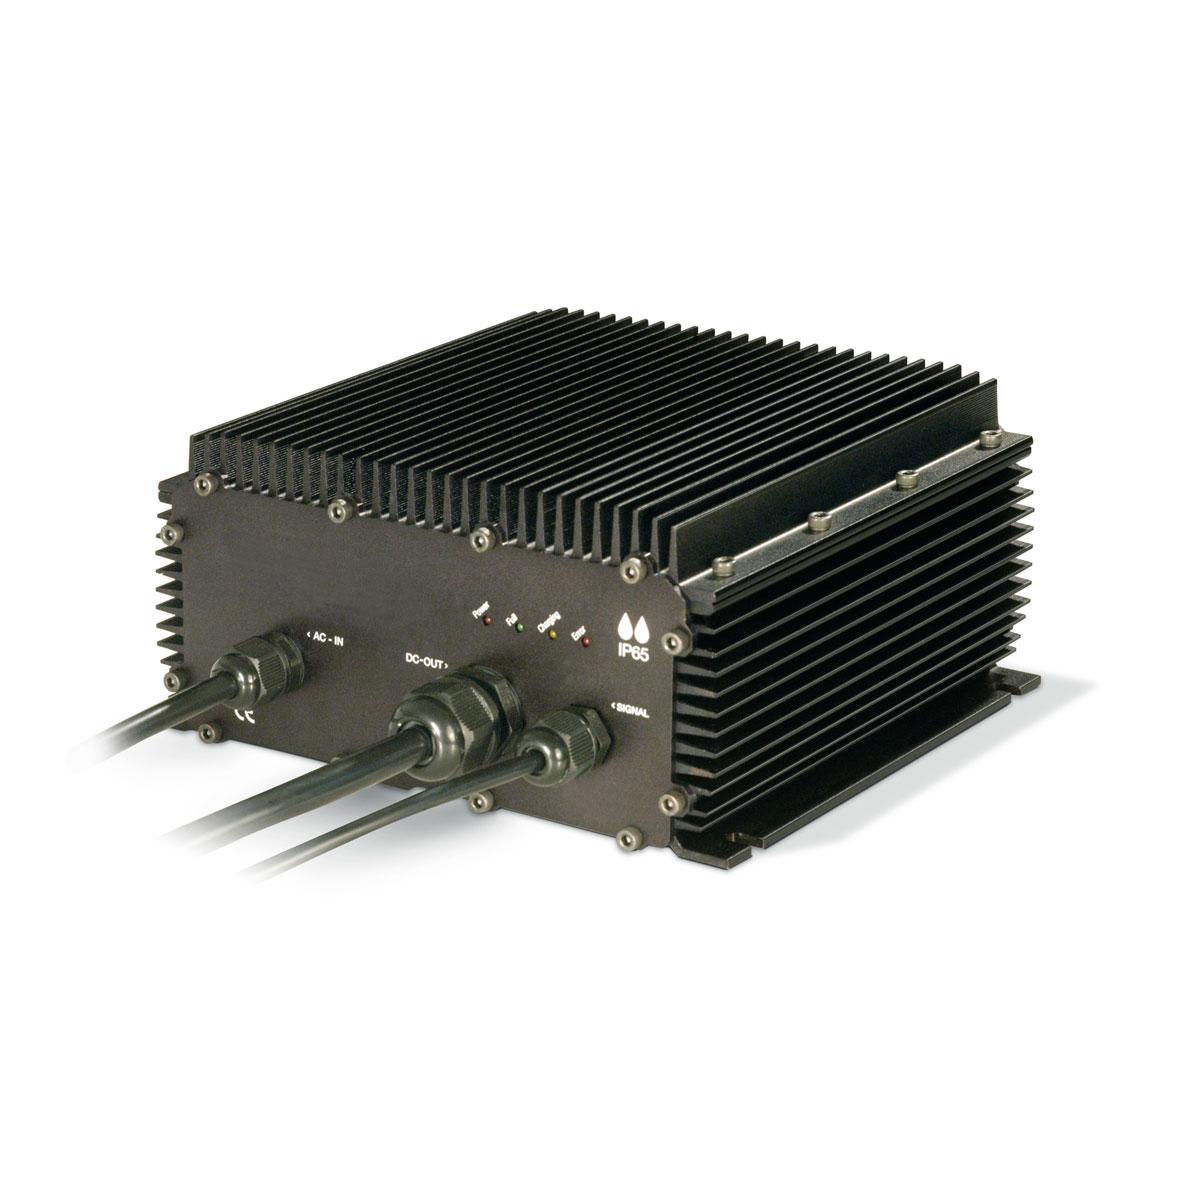 Fast сharger, Power, 26-104, зарядное устройство